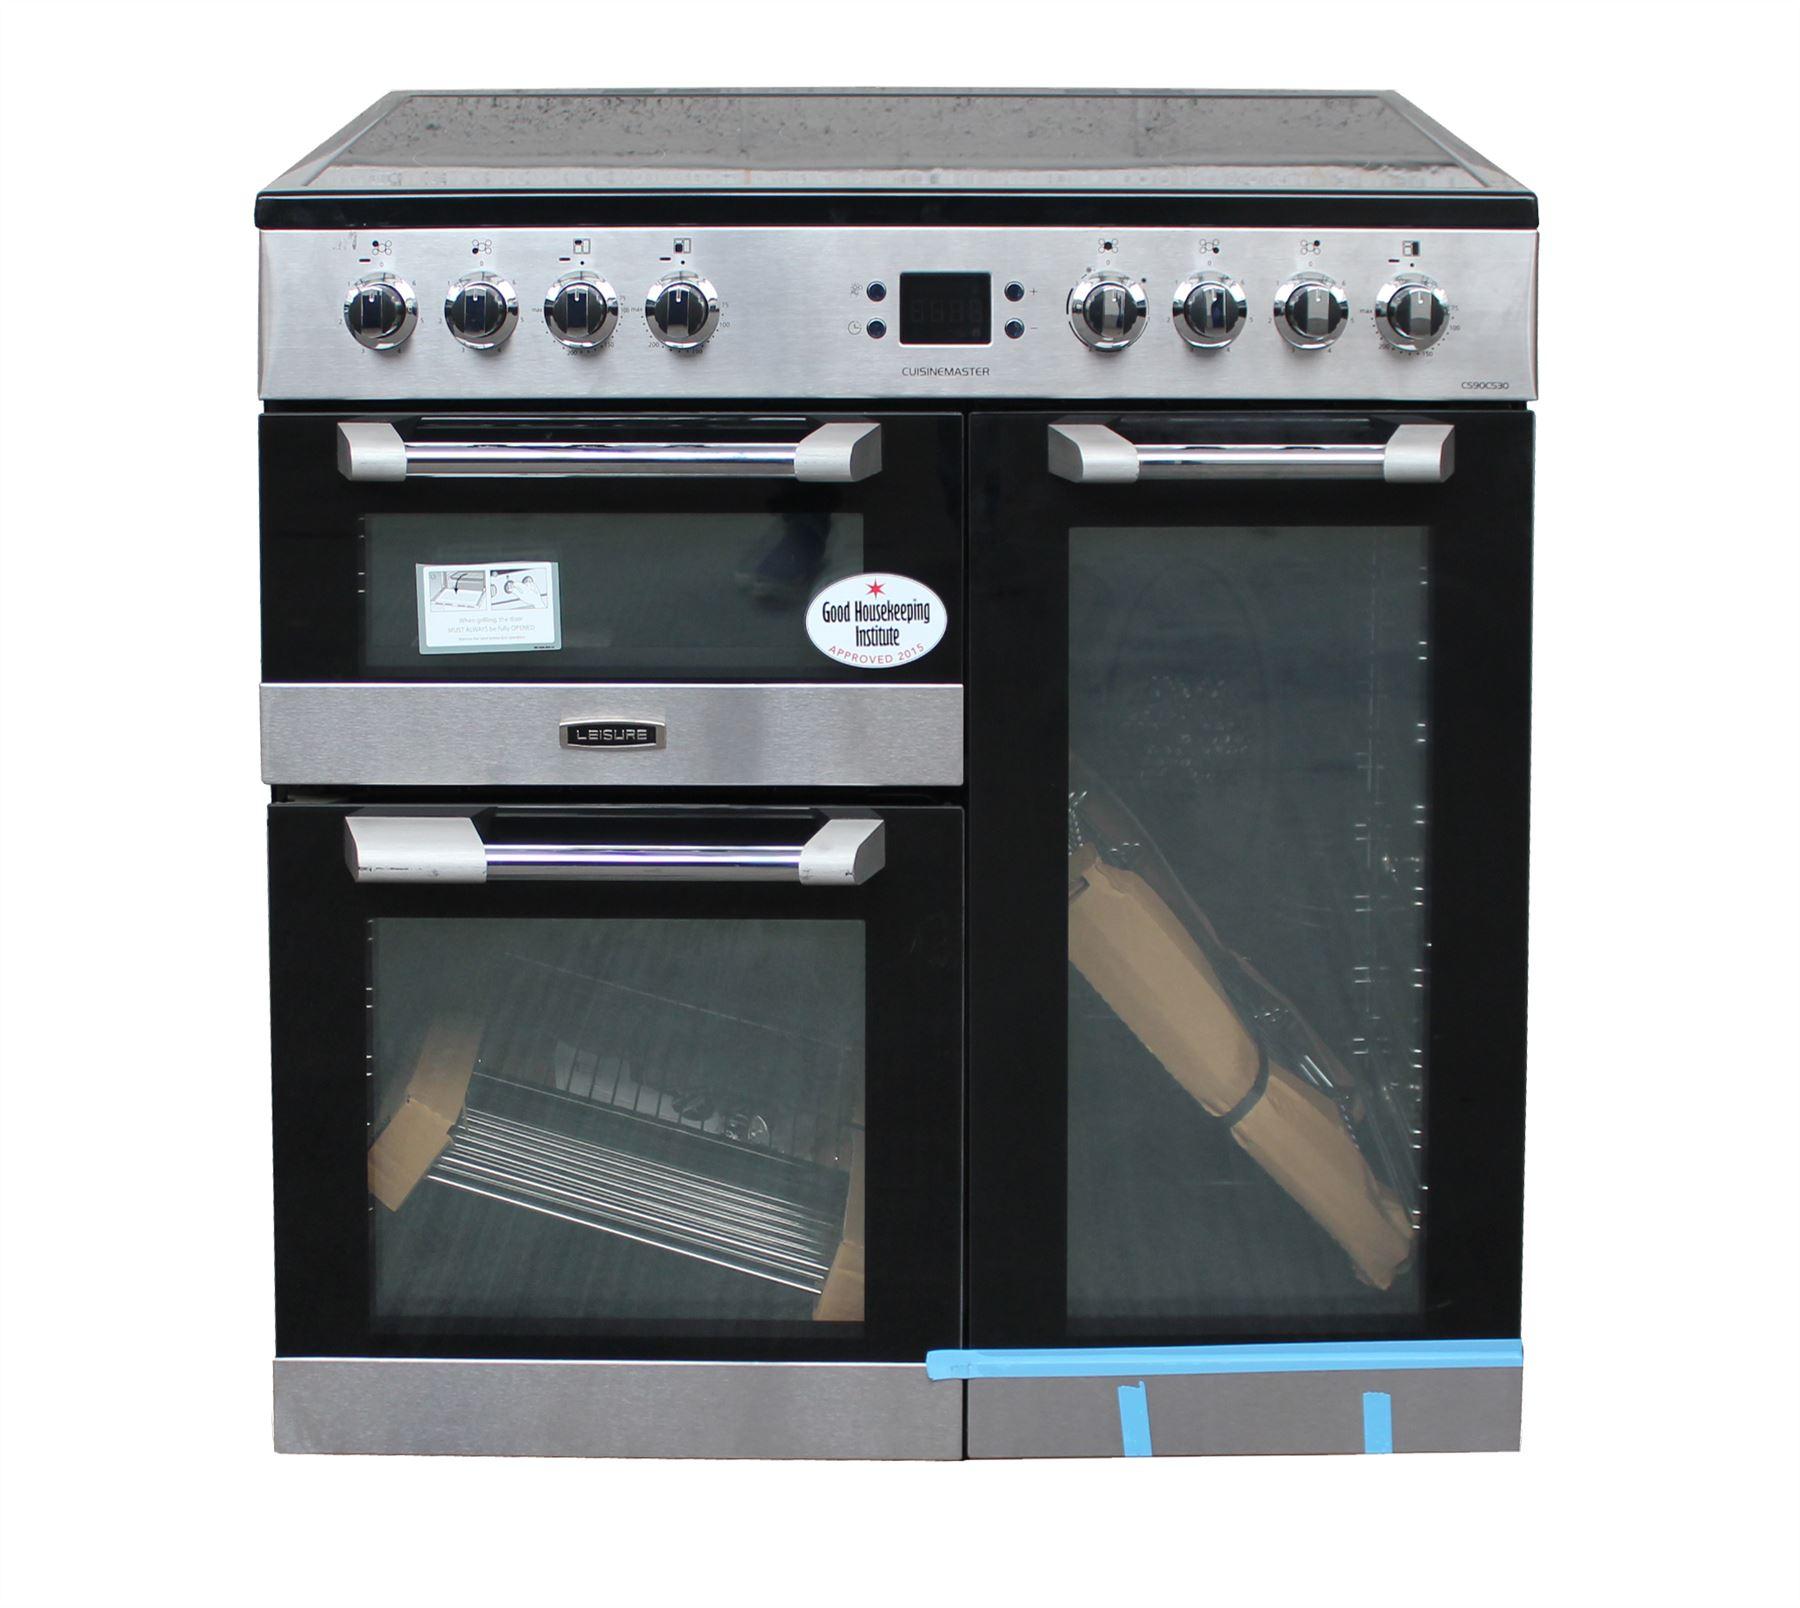 Leisure 90 Cm Electric Range Cooker Cs90c530x 3 Ovens